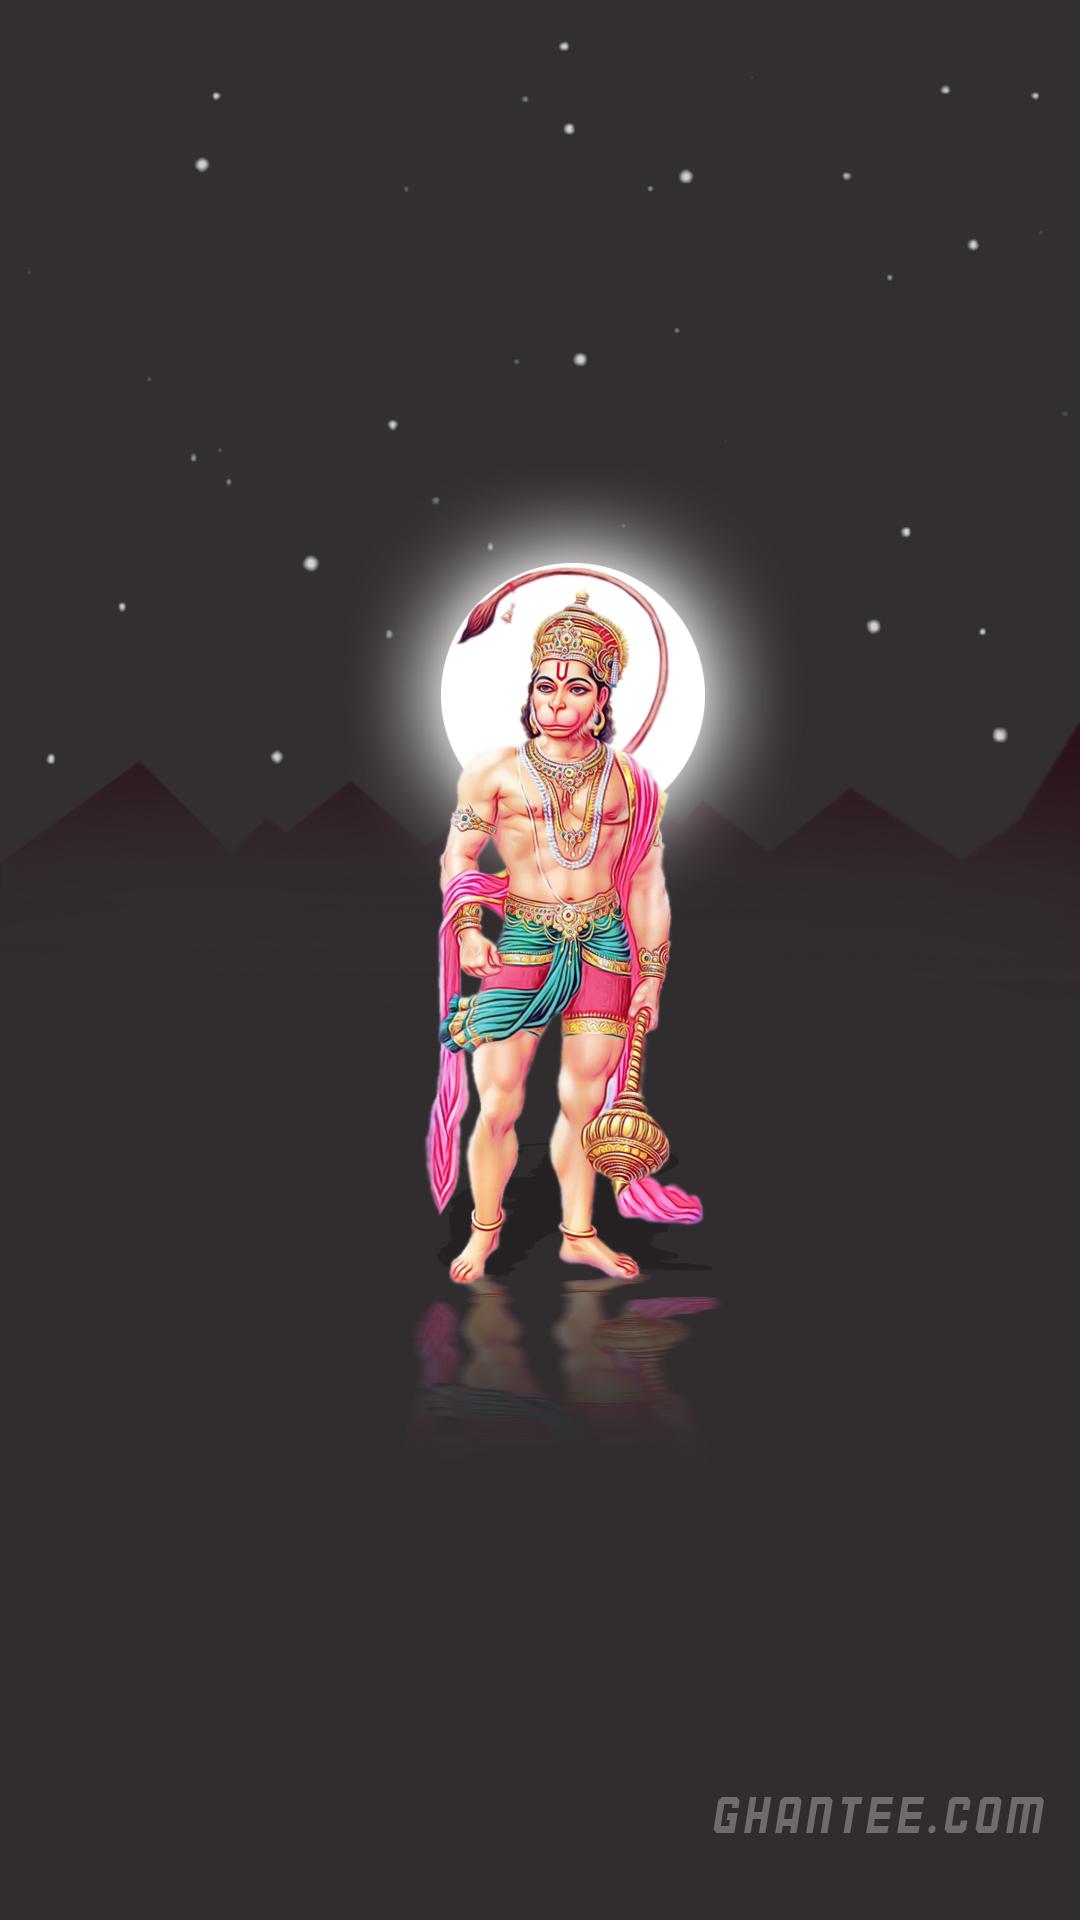 shri hanuman ji minimal mobile wallpaper HD